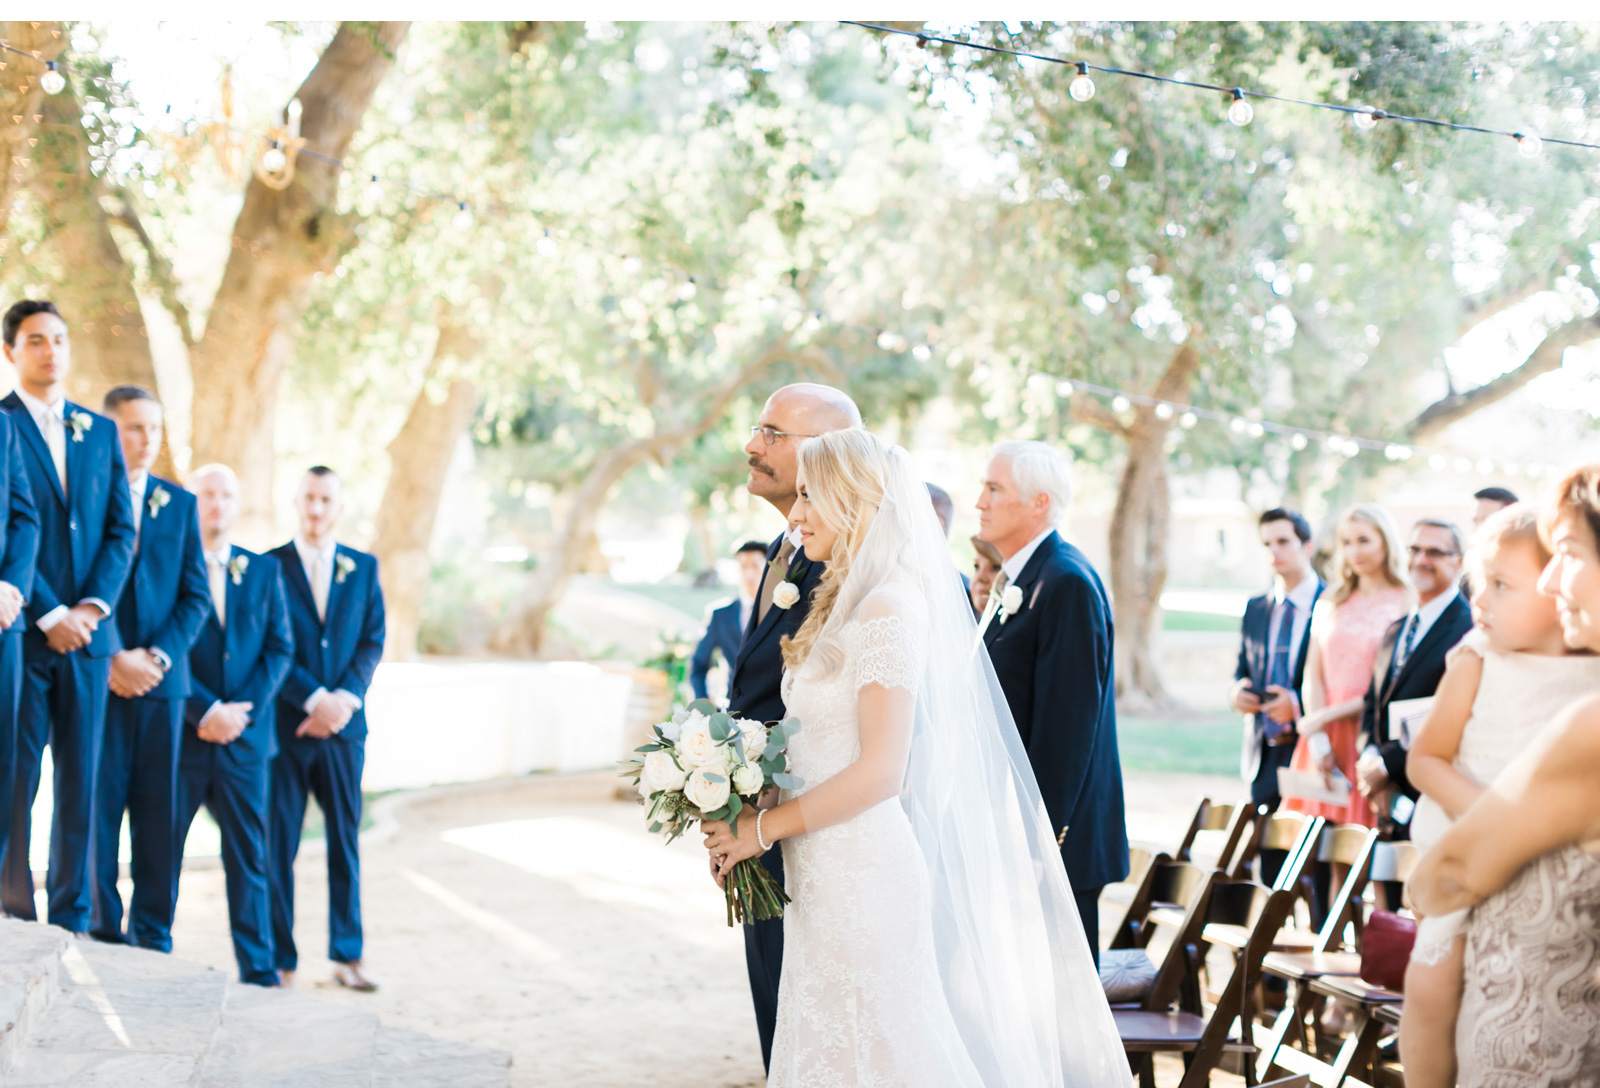 San-Luis-Obispo-Wedding-Photographer-Style-Me-Pretty-Natalie-Schutt-Photography_16.jpg